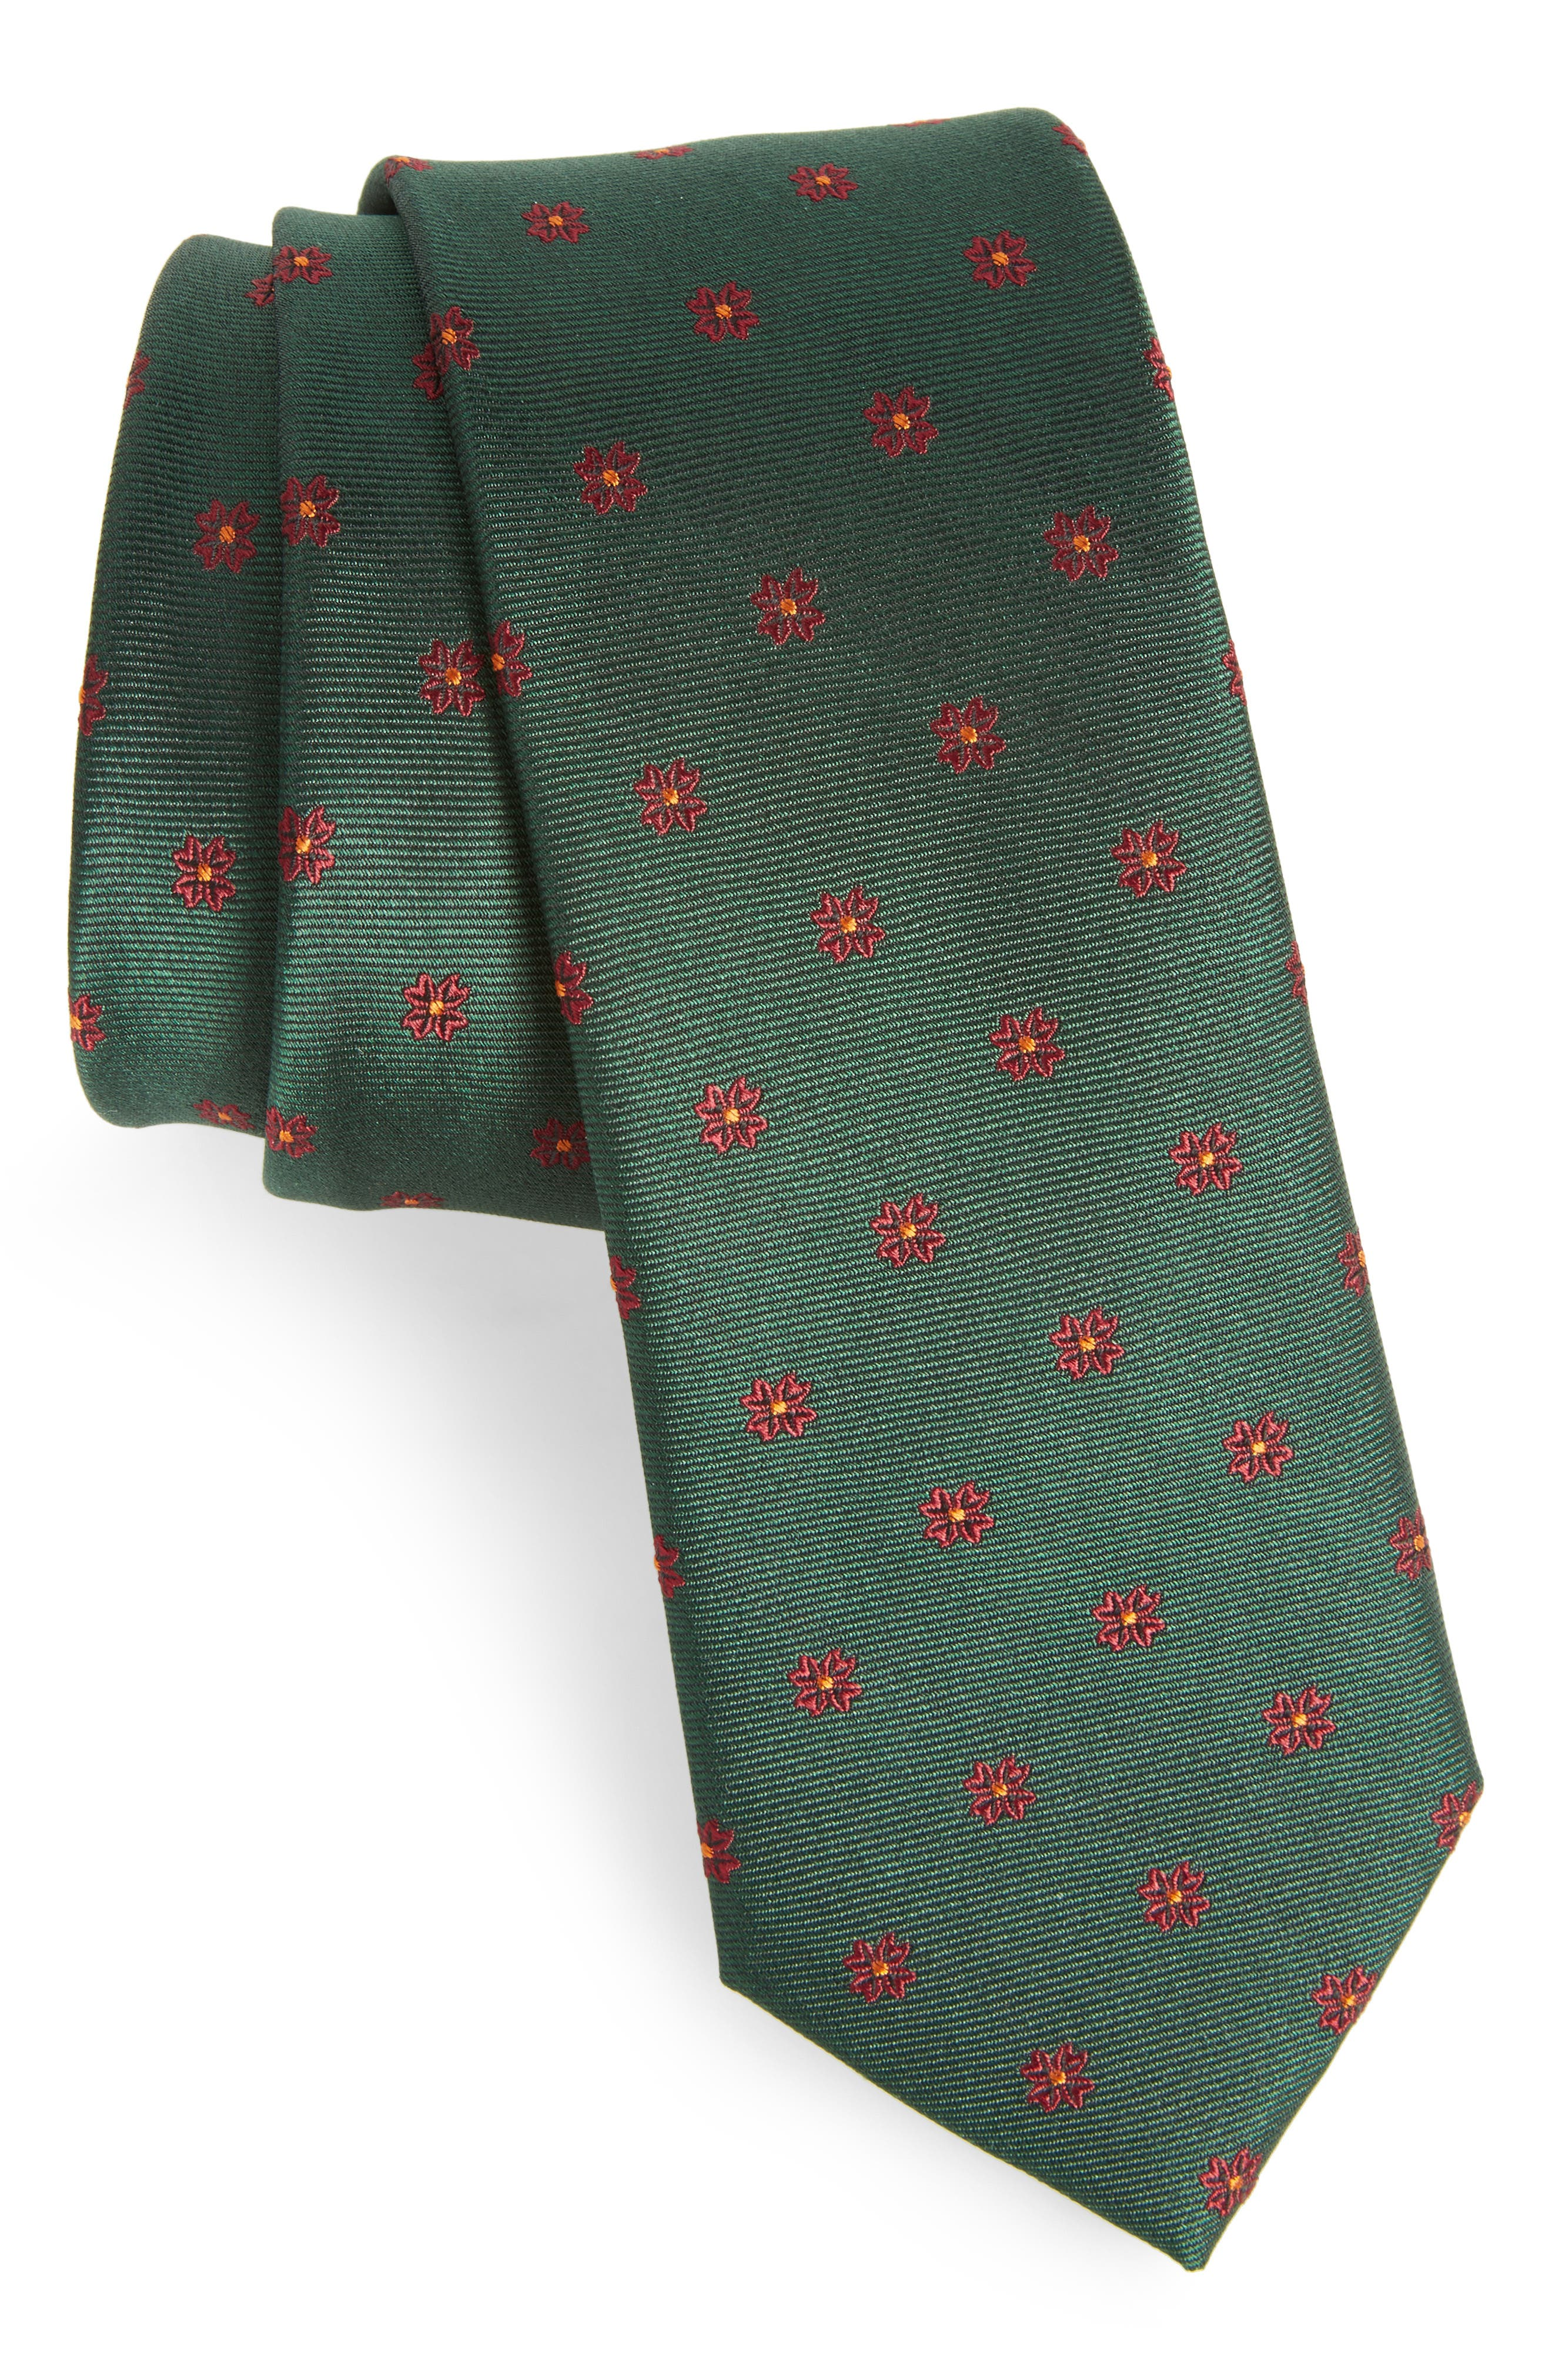 The Tie Bar Floral Span Medallion Silk Tie